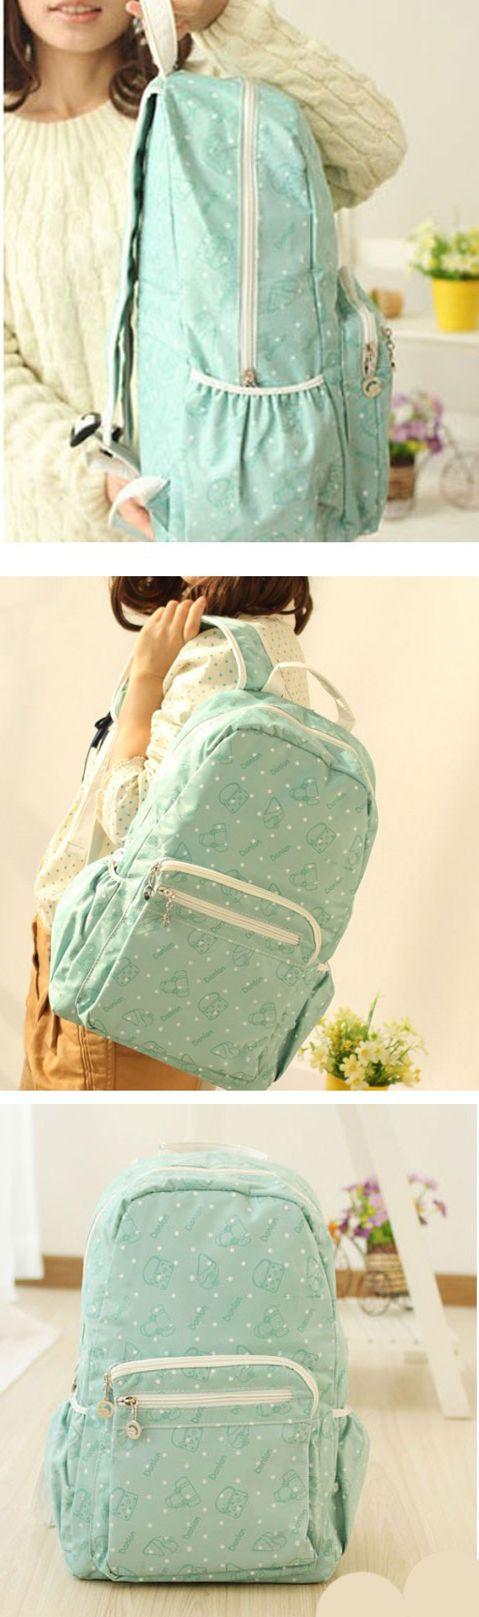 2017 Sweet Polka Dots Mint Green School Backpack for Girls, backpacks for girls, pink backpack, mini backpack, cool backpacks, backpacks for women